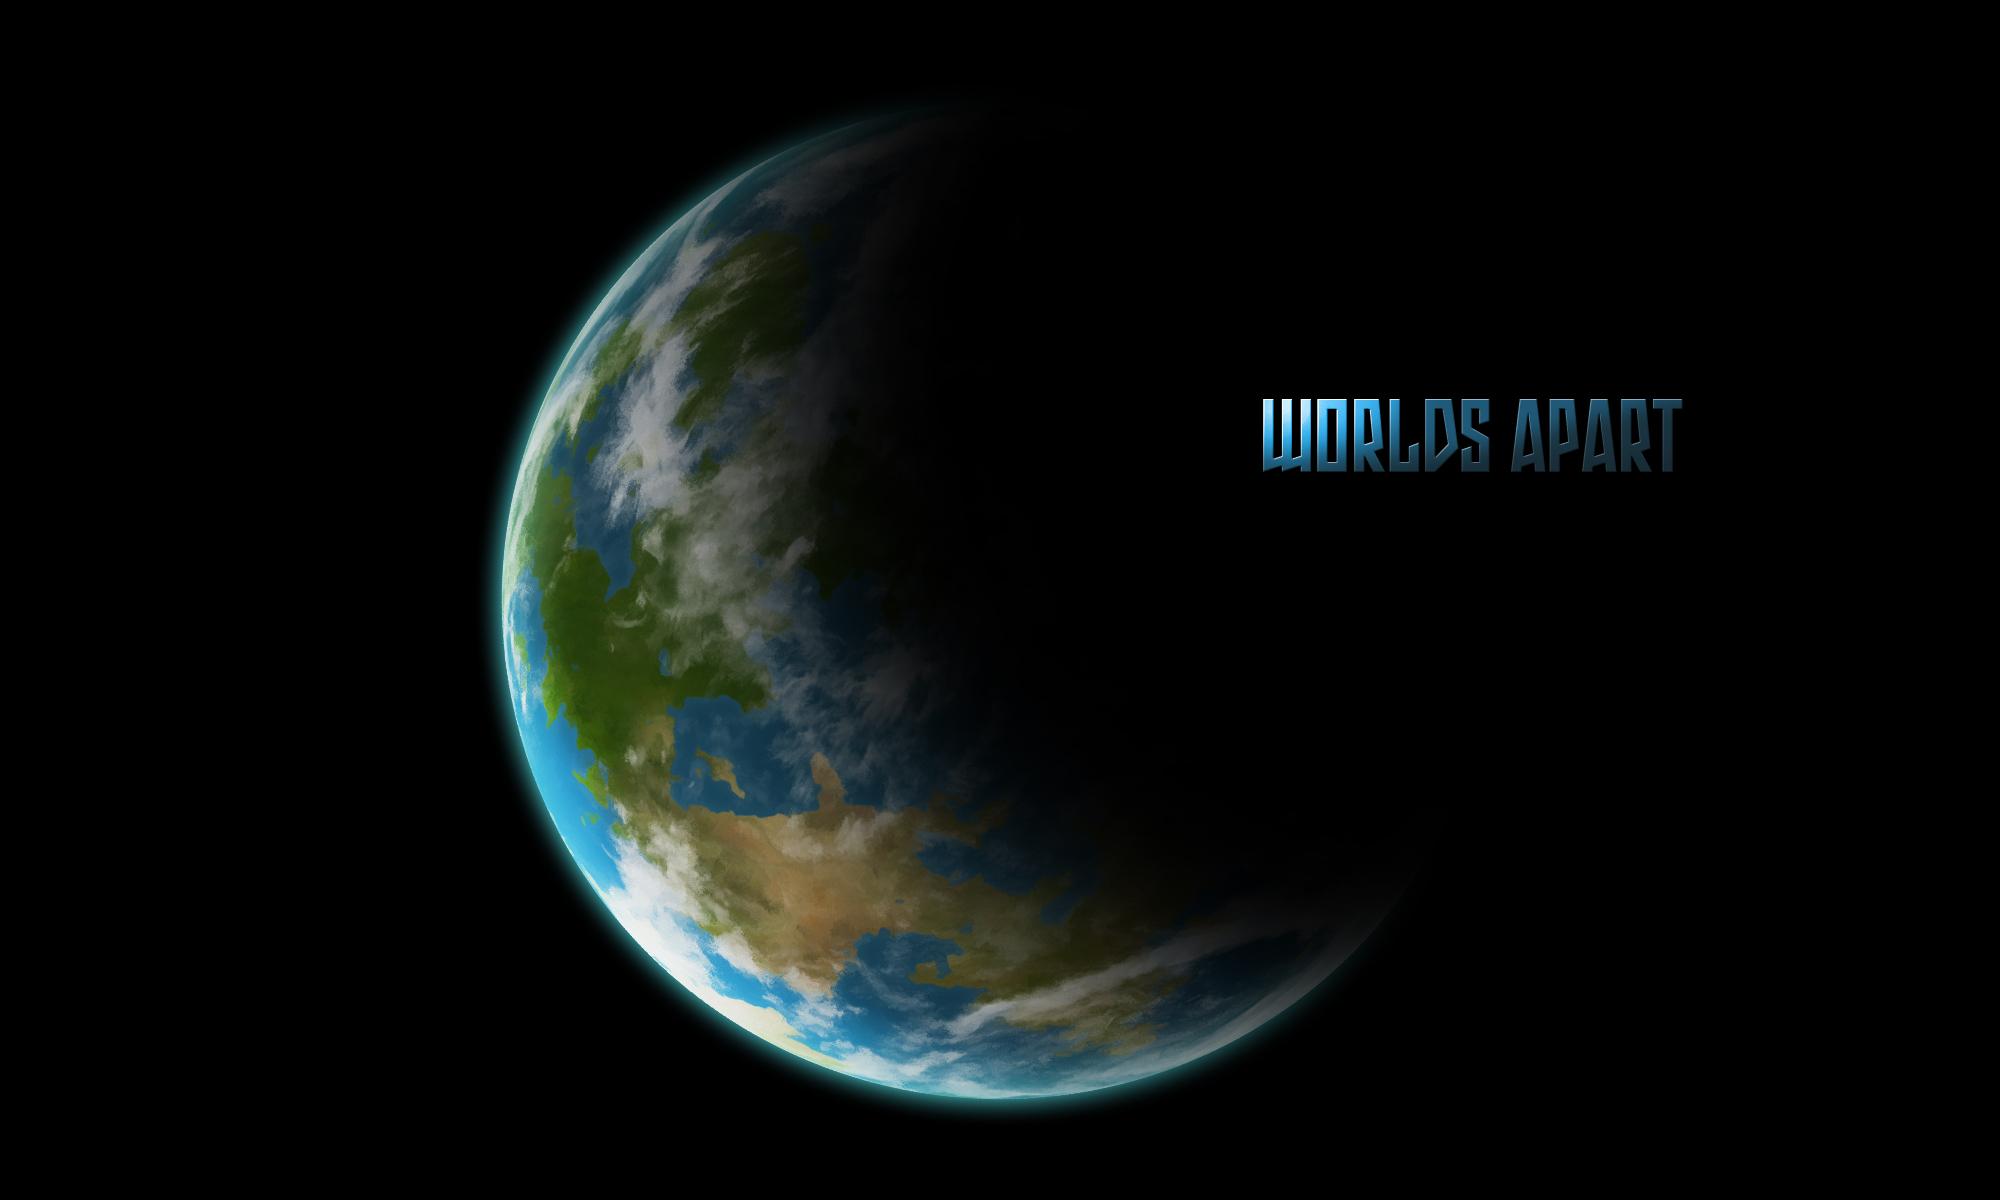 earth like world planet - photo #26